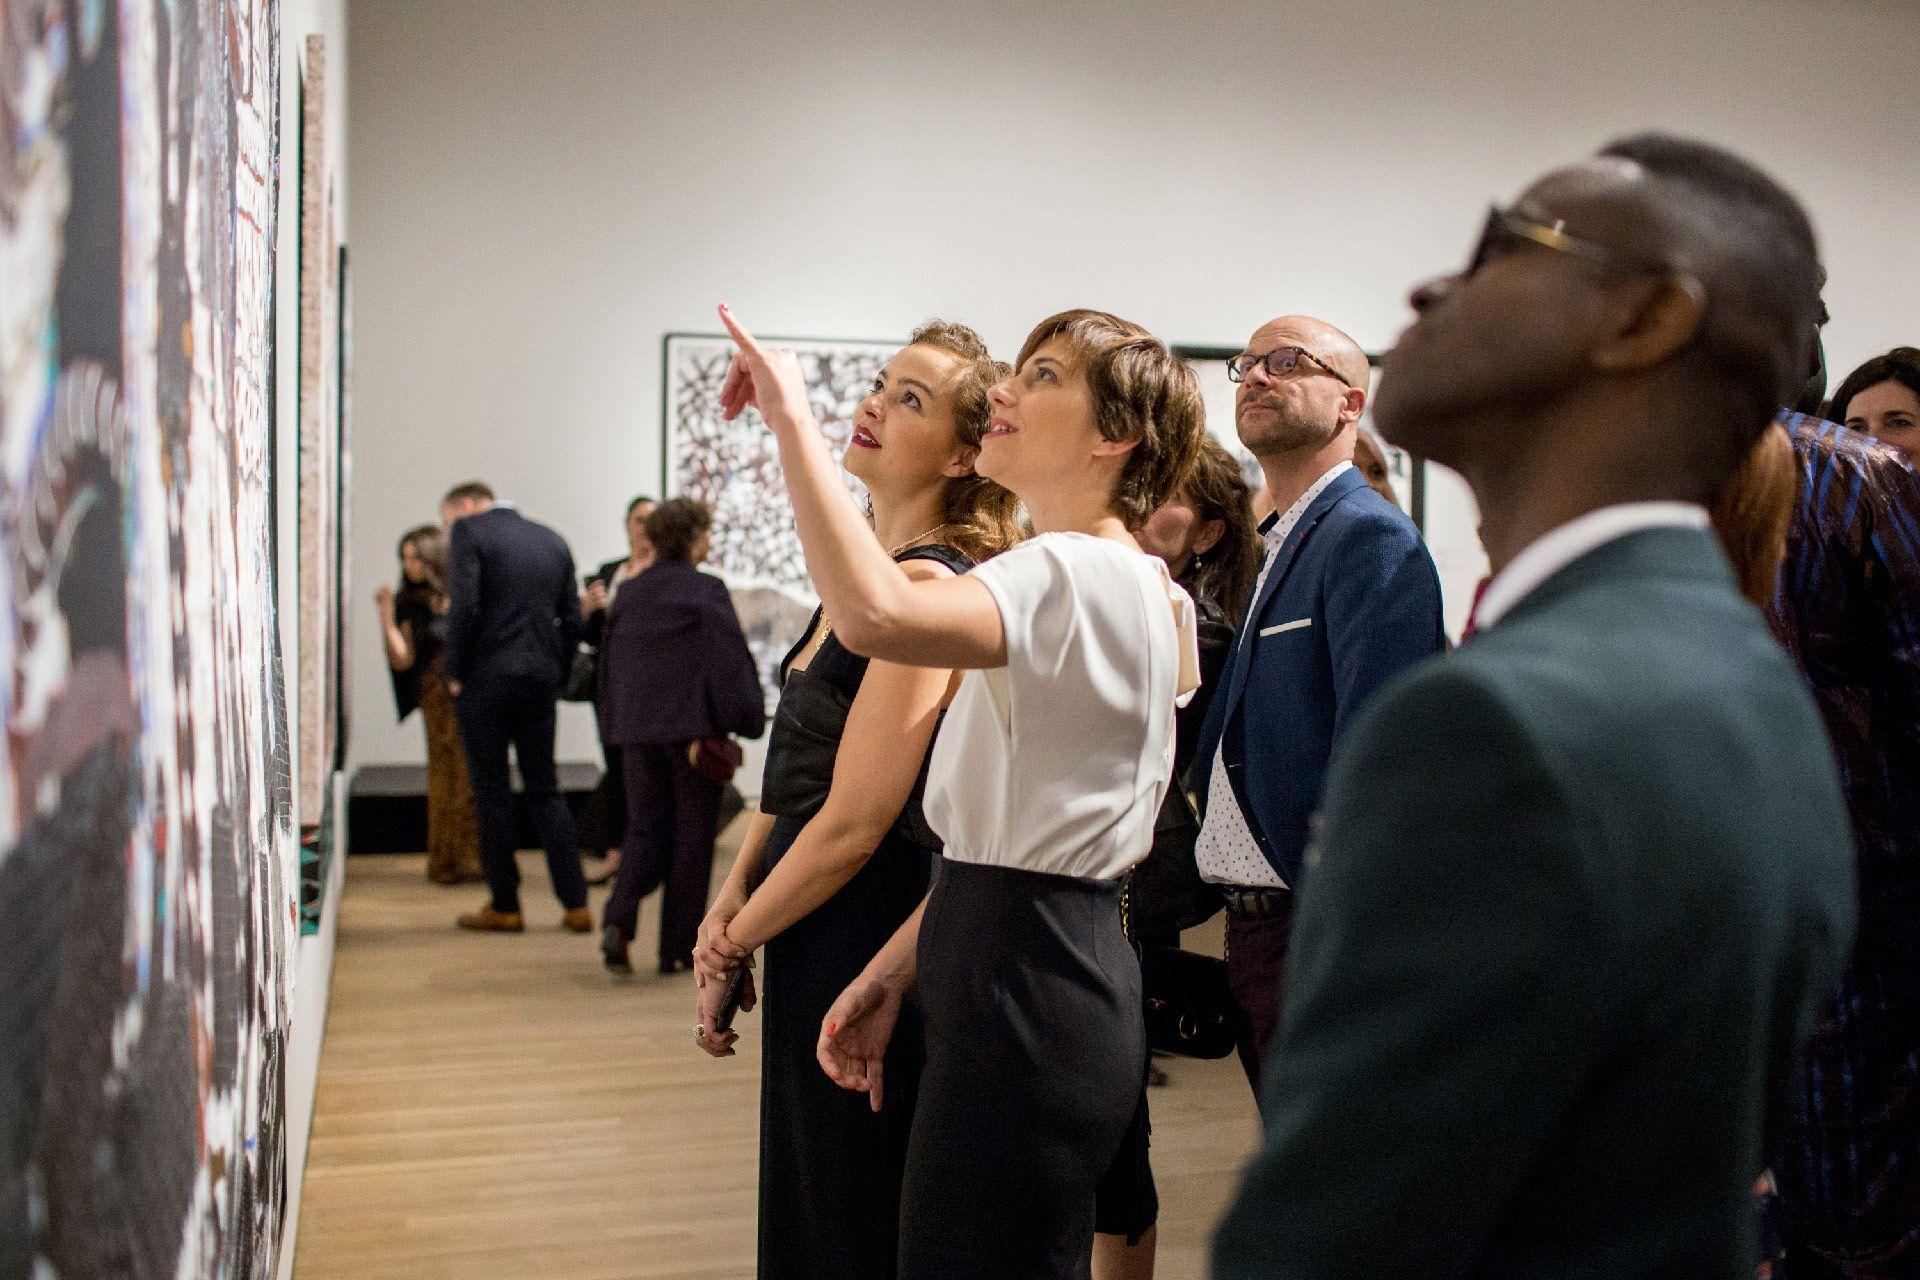 Members of MMFA's Angel Circle durine Omar Ba's exhibition